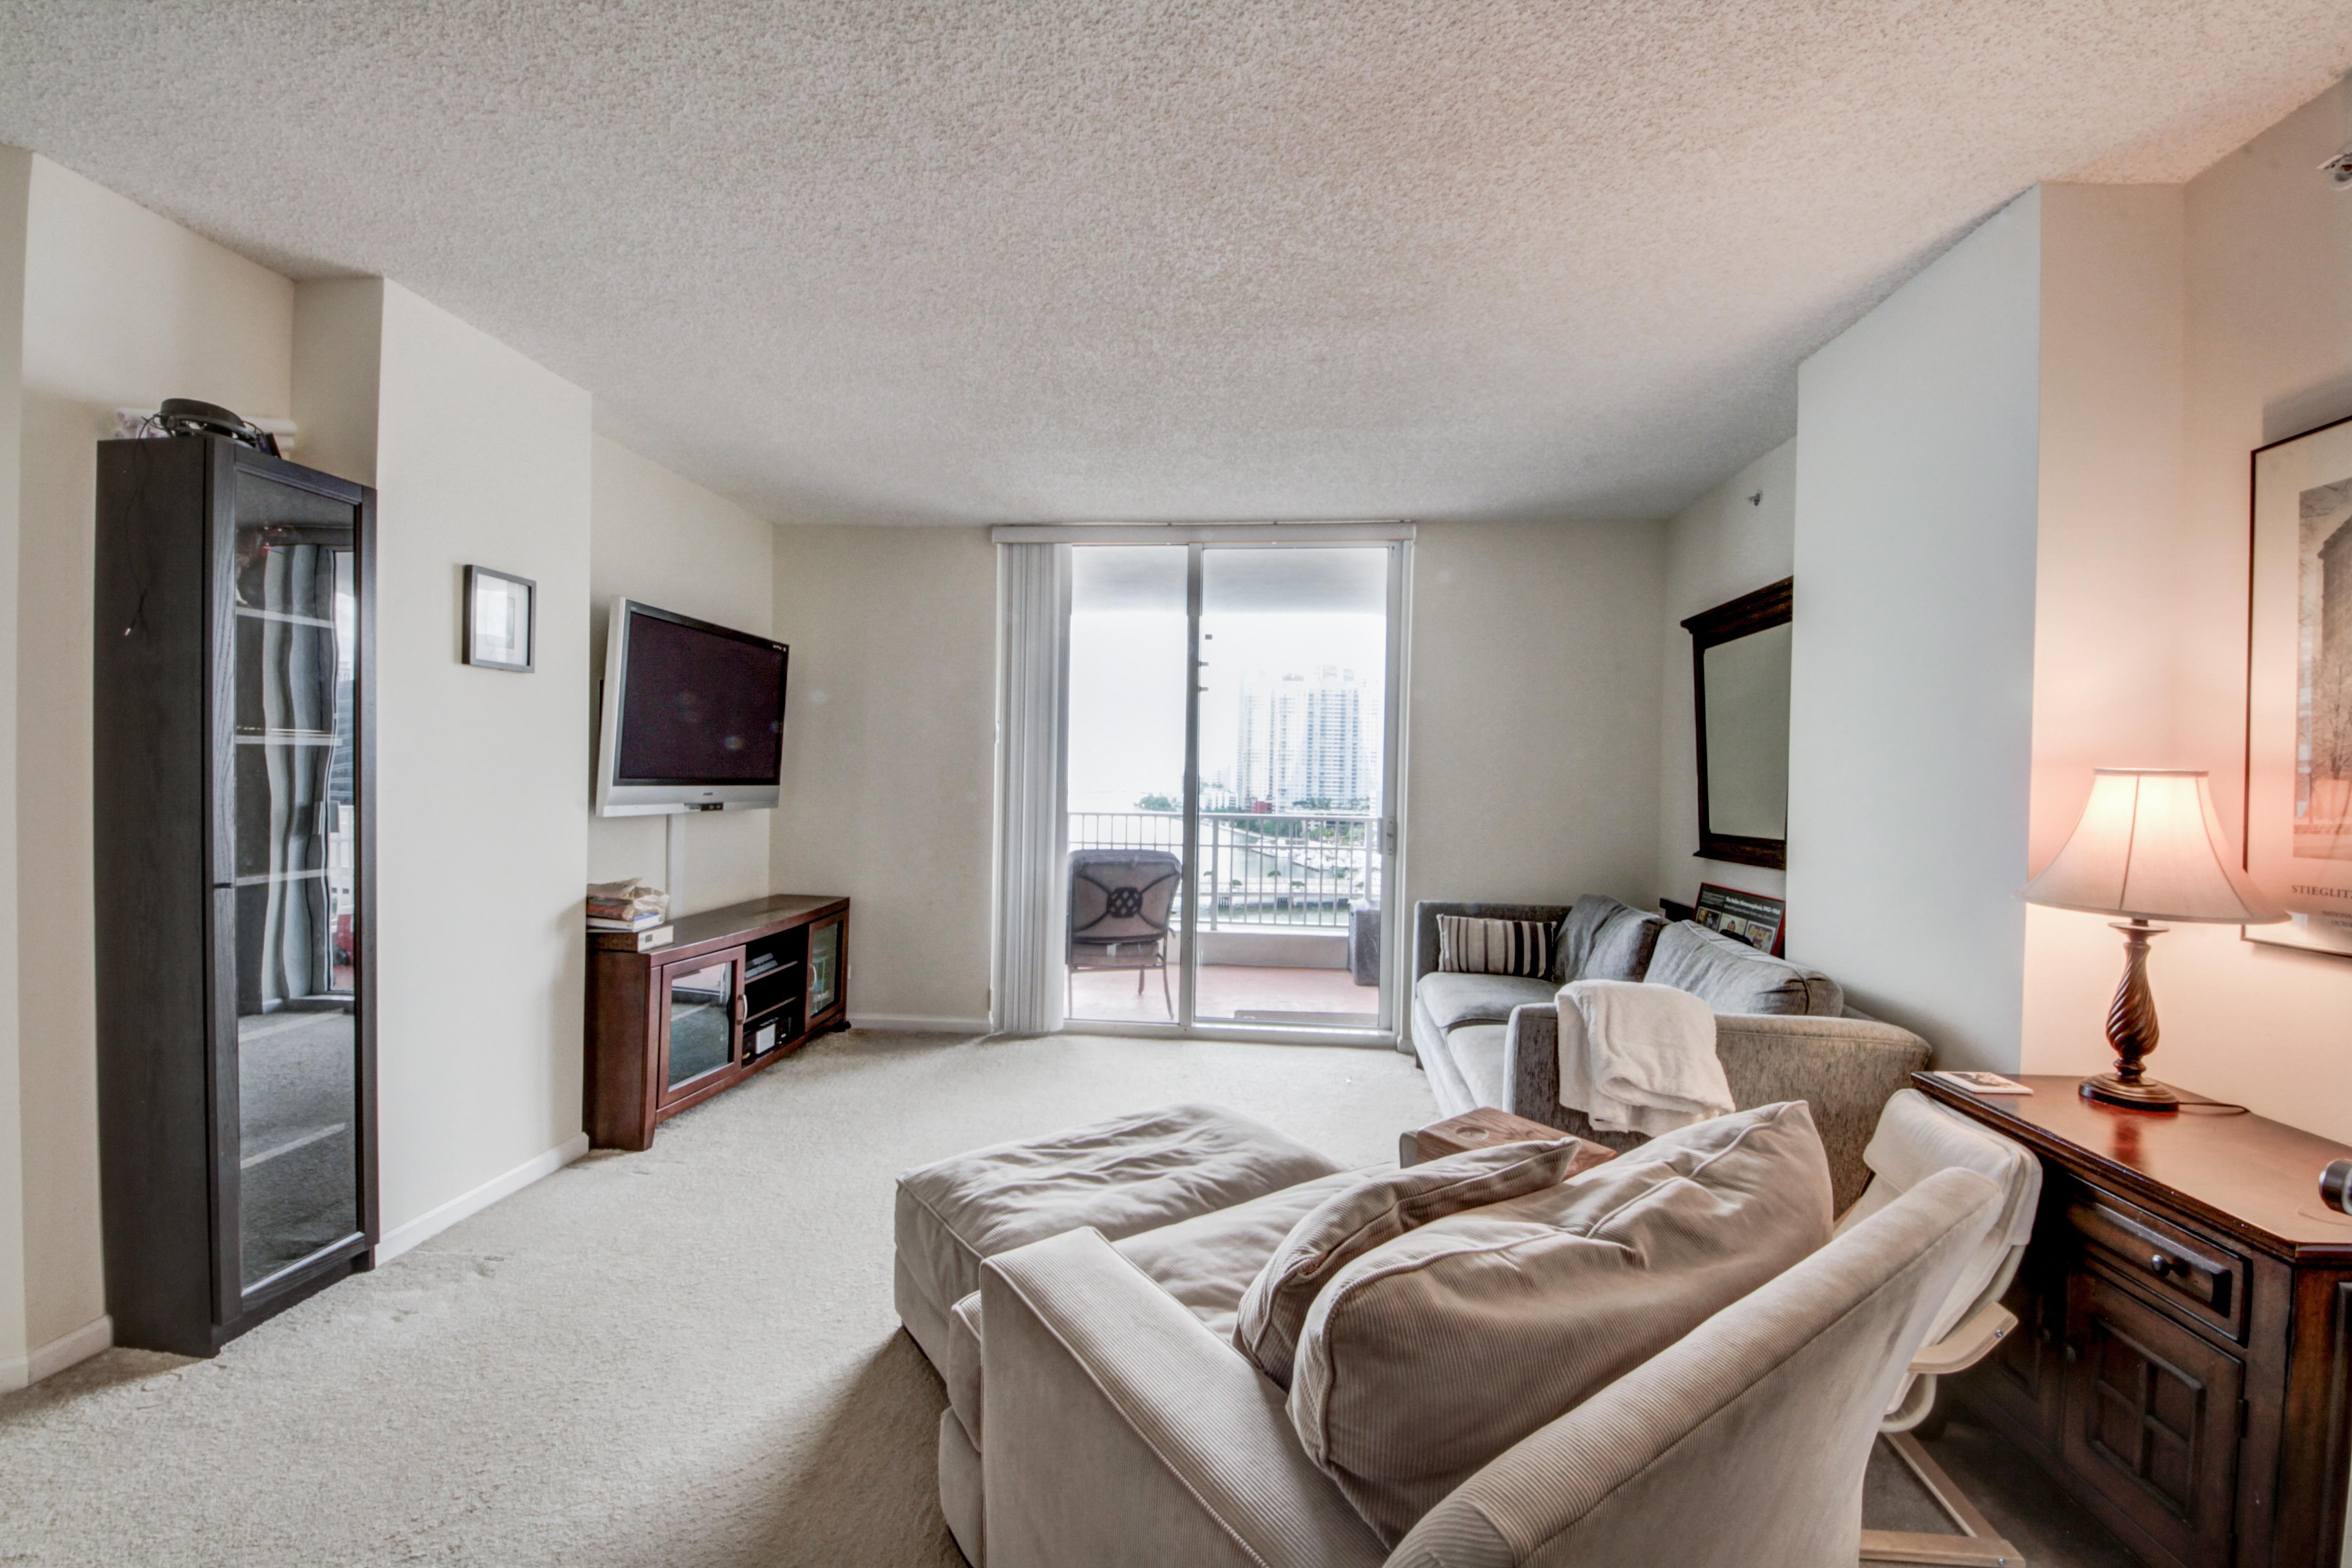 Condominium for Sale at 701 Brickell Key Blvd #1102 701 Brickell Key Blvd 1102 Miami, Florida, 33131 United States